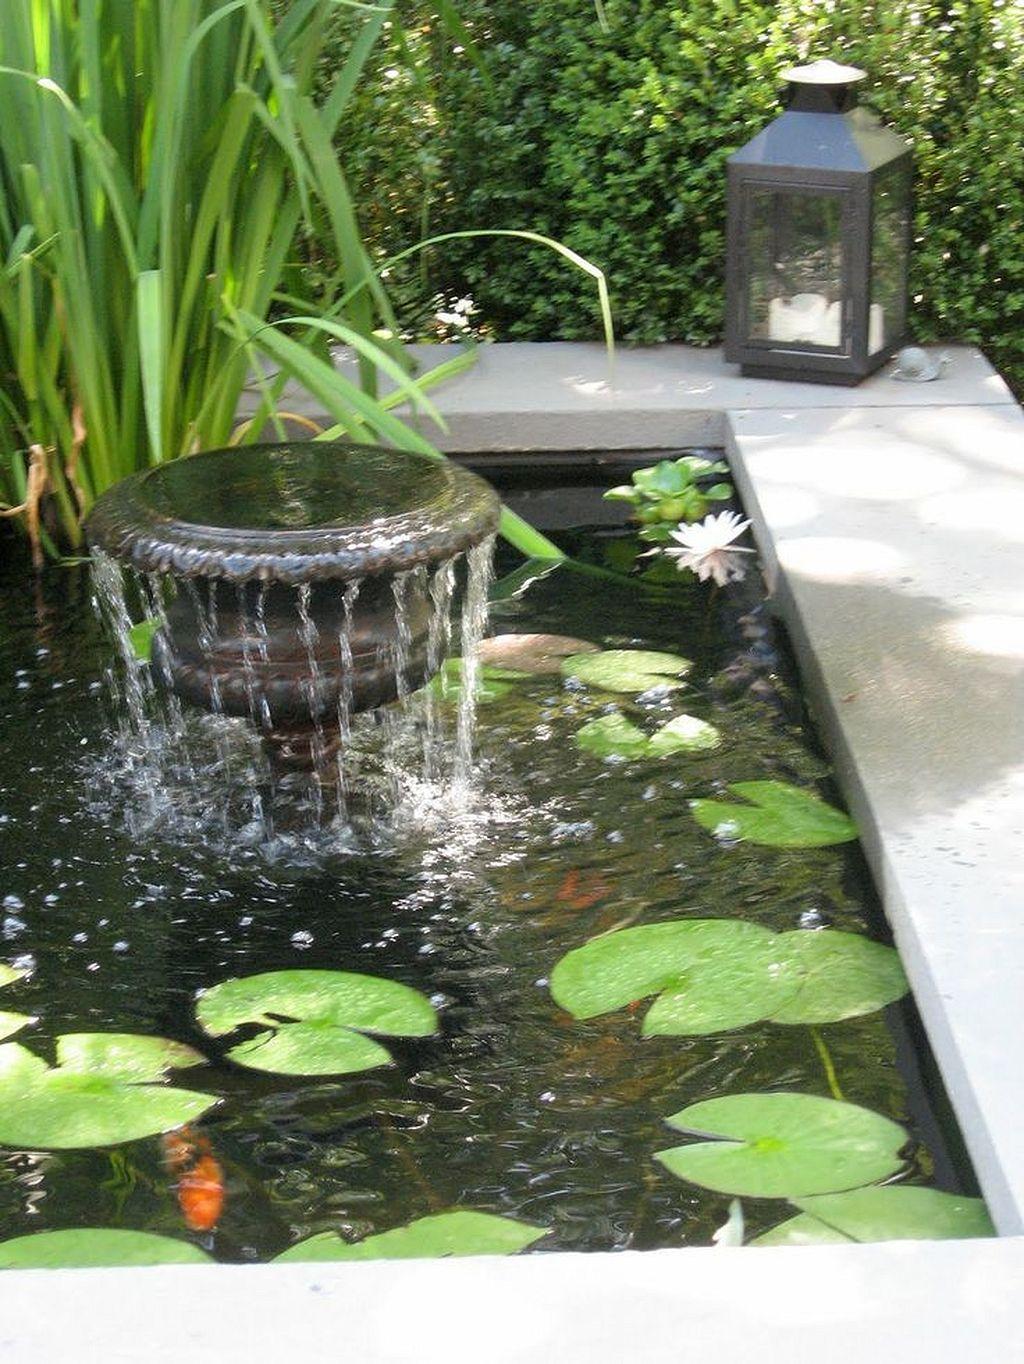 Gorgeous 30 Creative Pond And Fountain Ideas Https Gardenmagz Com 30 Creative Pond And Fountain I Diy Garden Fountains Backyard Water Feature Ponds Backyard